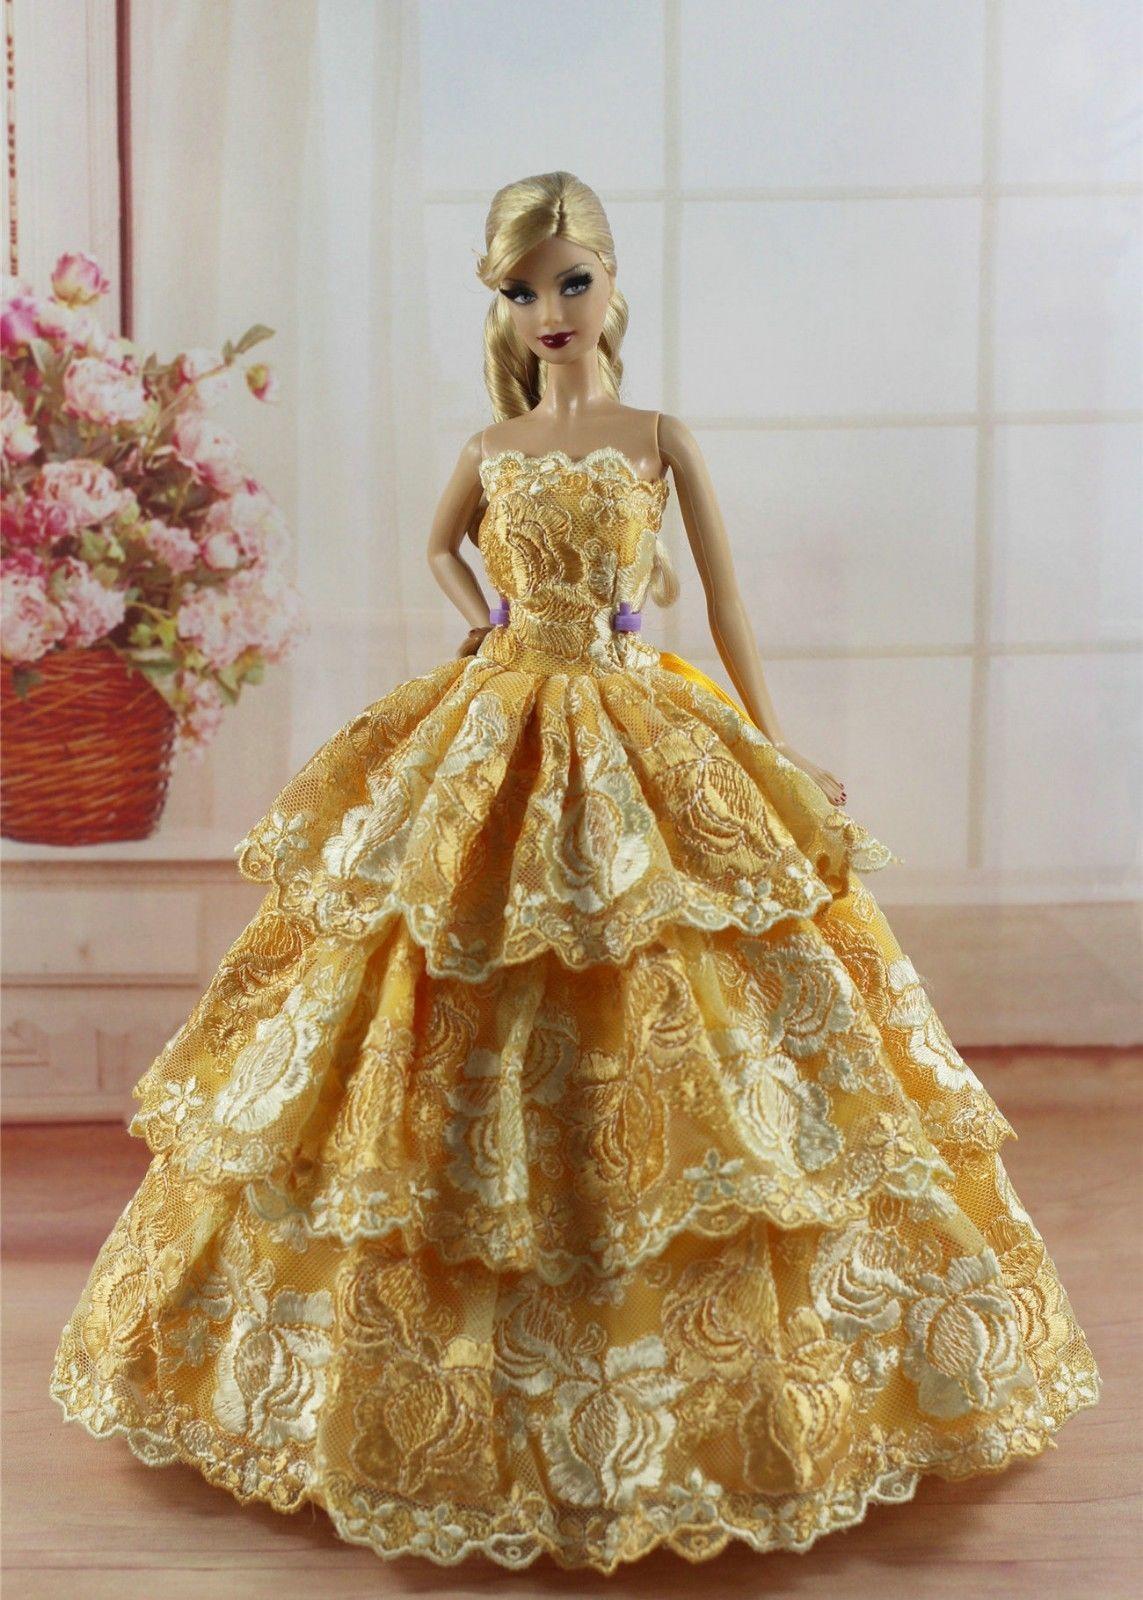 1fa8800fc9697 Details about Lot 20 items= 10 Princes Dress/Wedding Clothes/Gown+10 ...